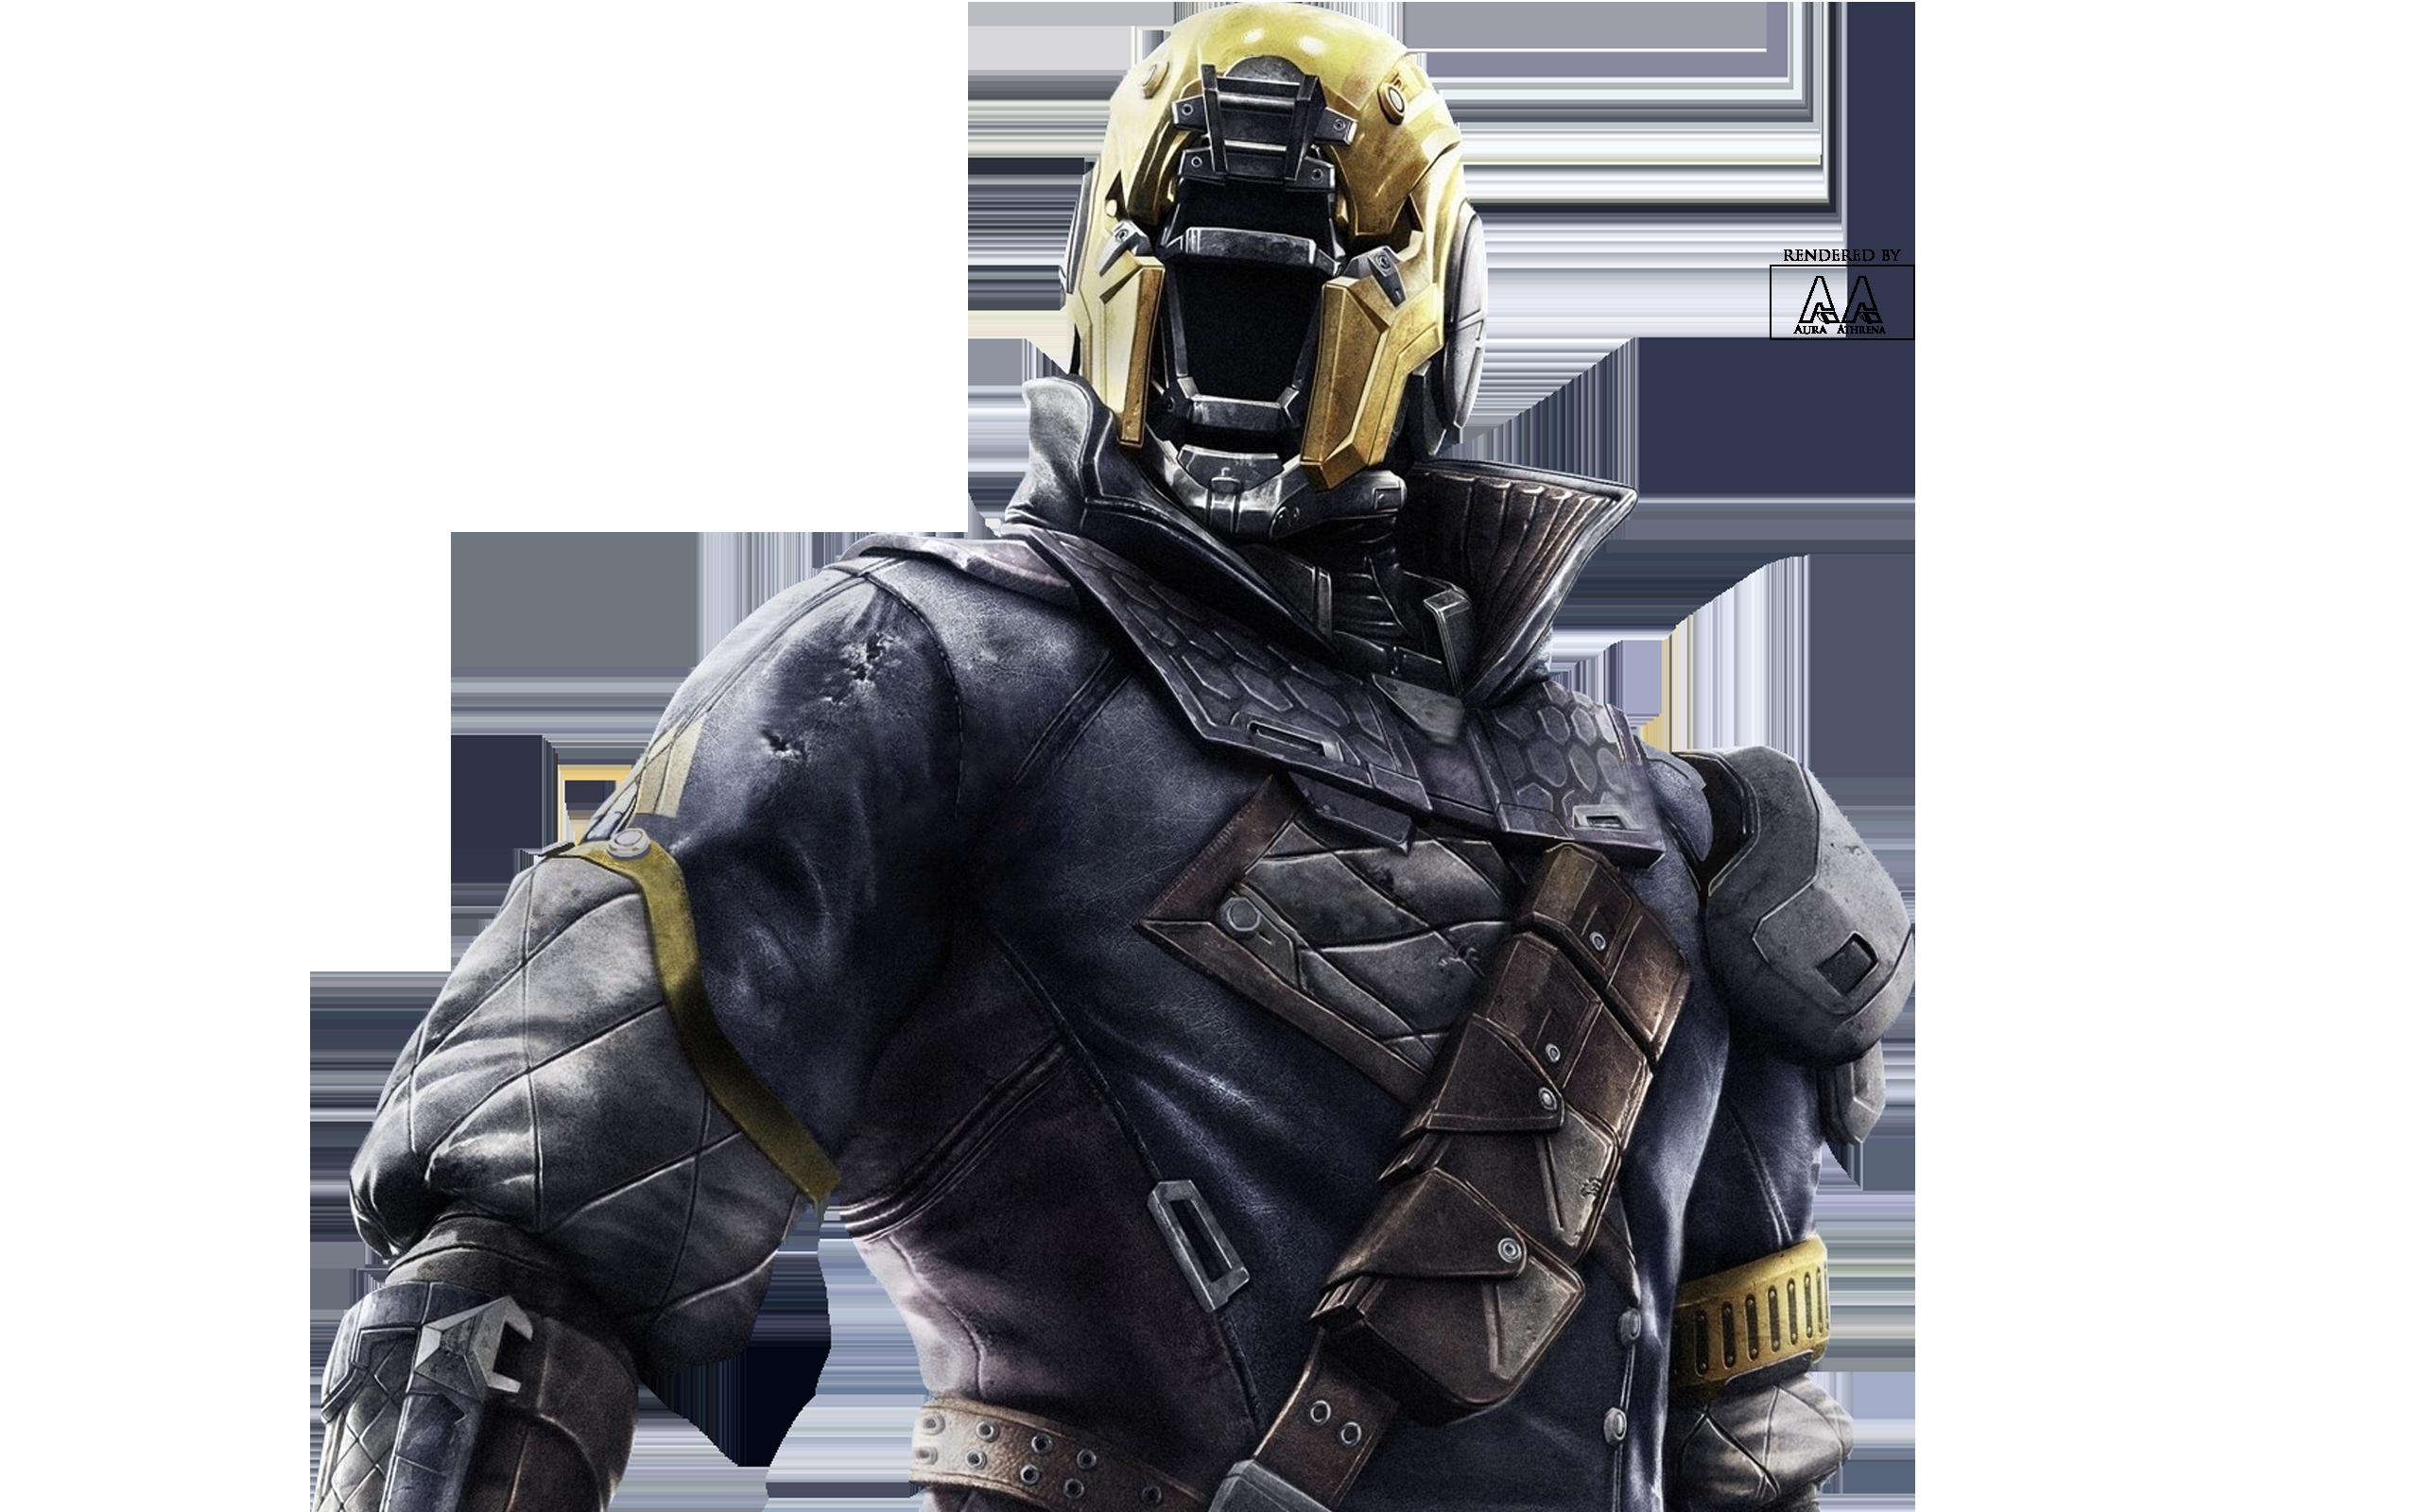 Destiny game clipart free download Destiny game clipart - ClipartFest free download